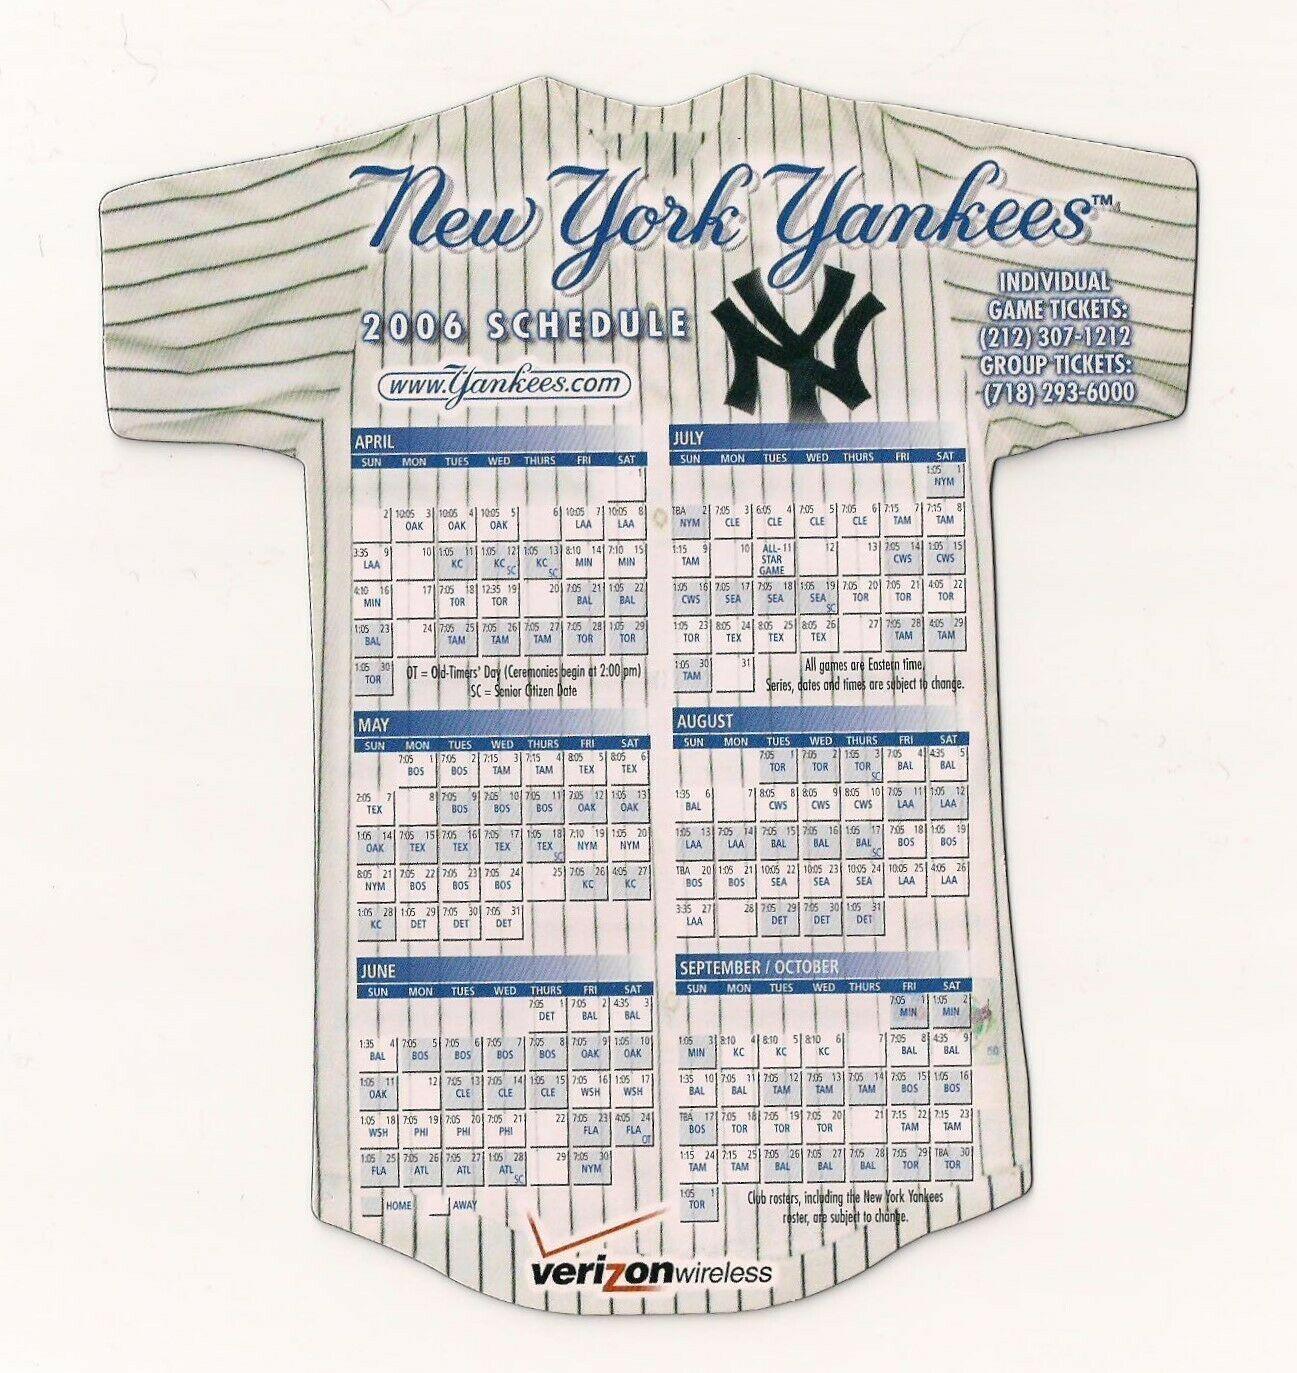 2006 New York Yankees Baseball Magnet Schedule Verizon Wireless In 2020 New York Yankees Baseball Yankees Baseball Baseball Magnets